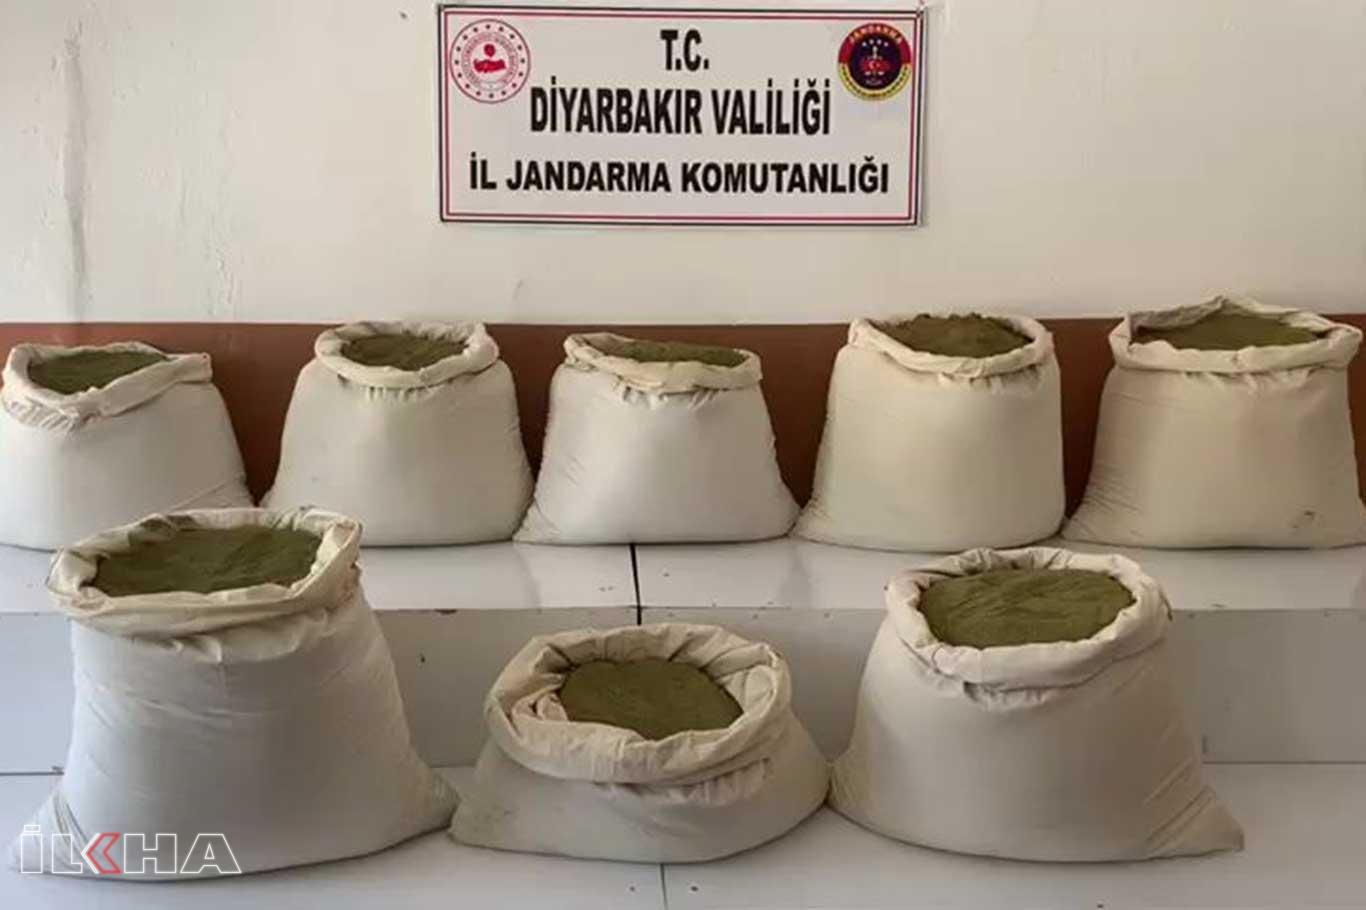 Diyarbakırda 140 kilo esrar ele geçirildi.